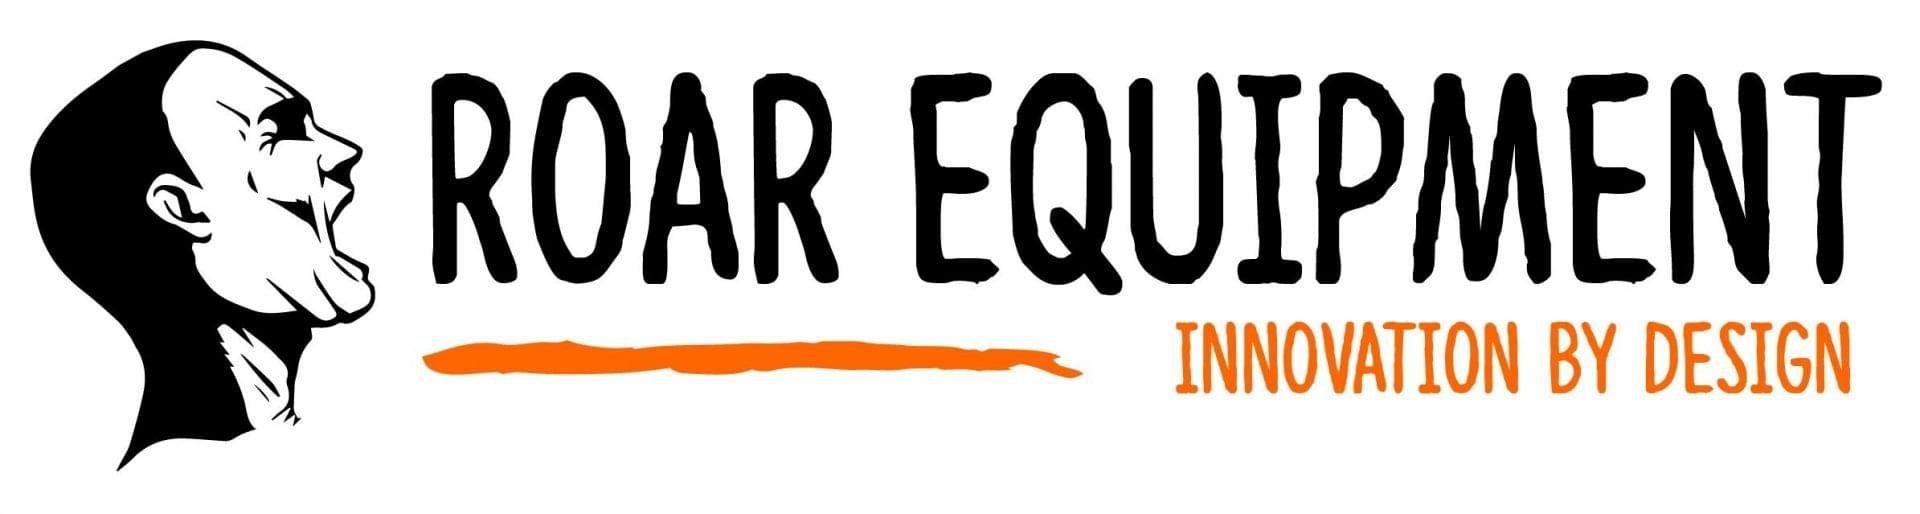 Roar Equipment Logo